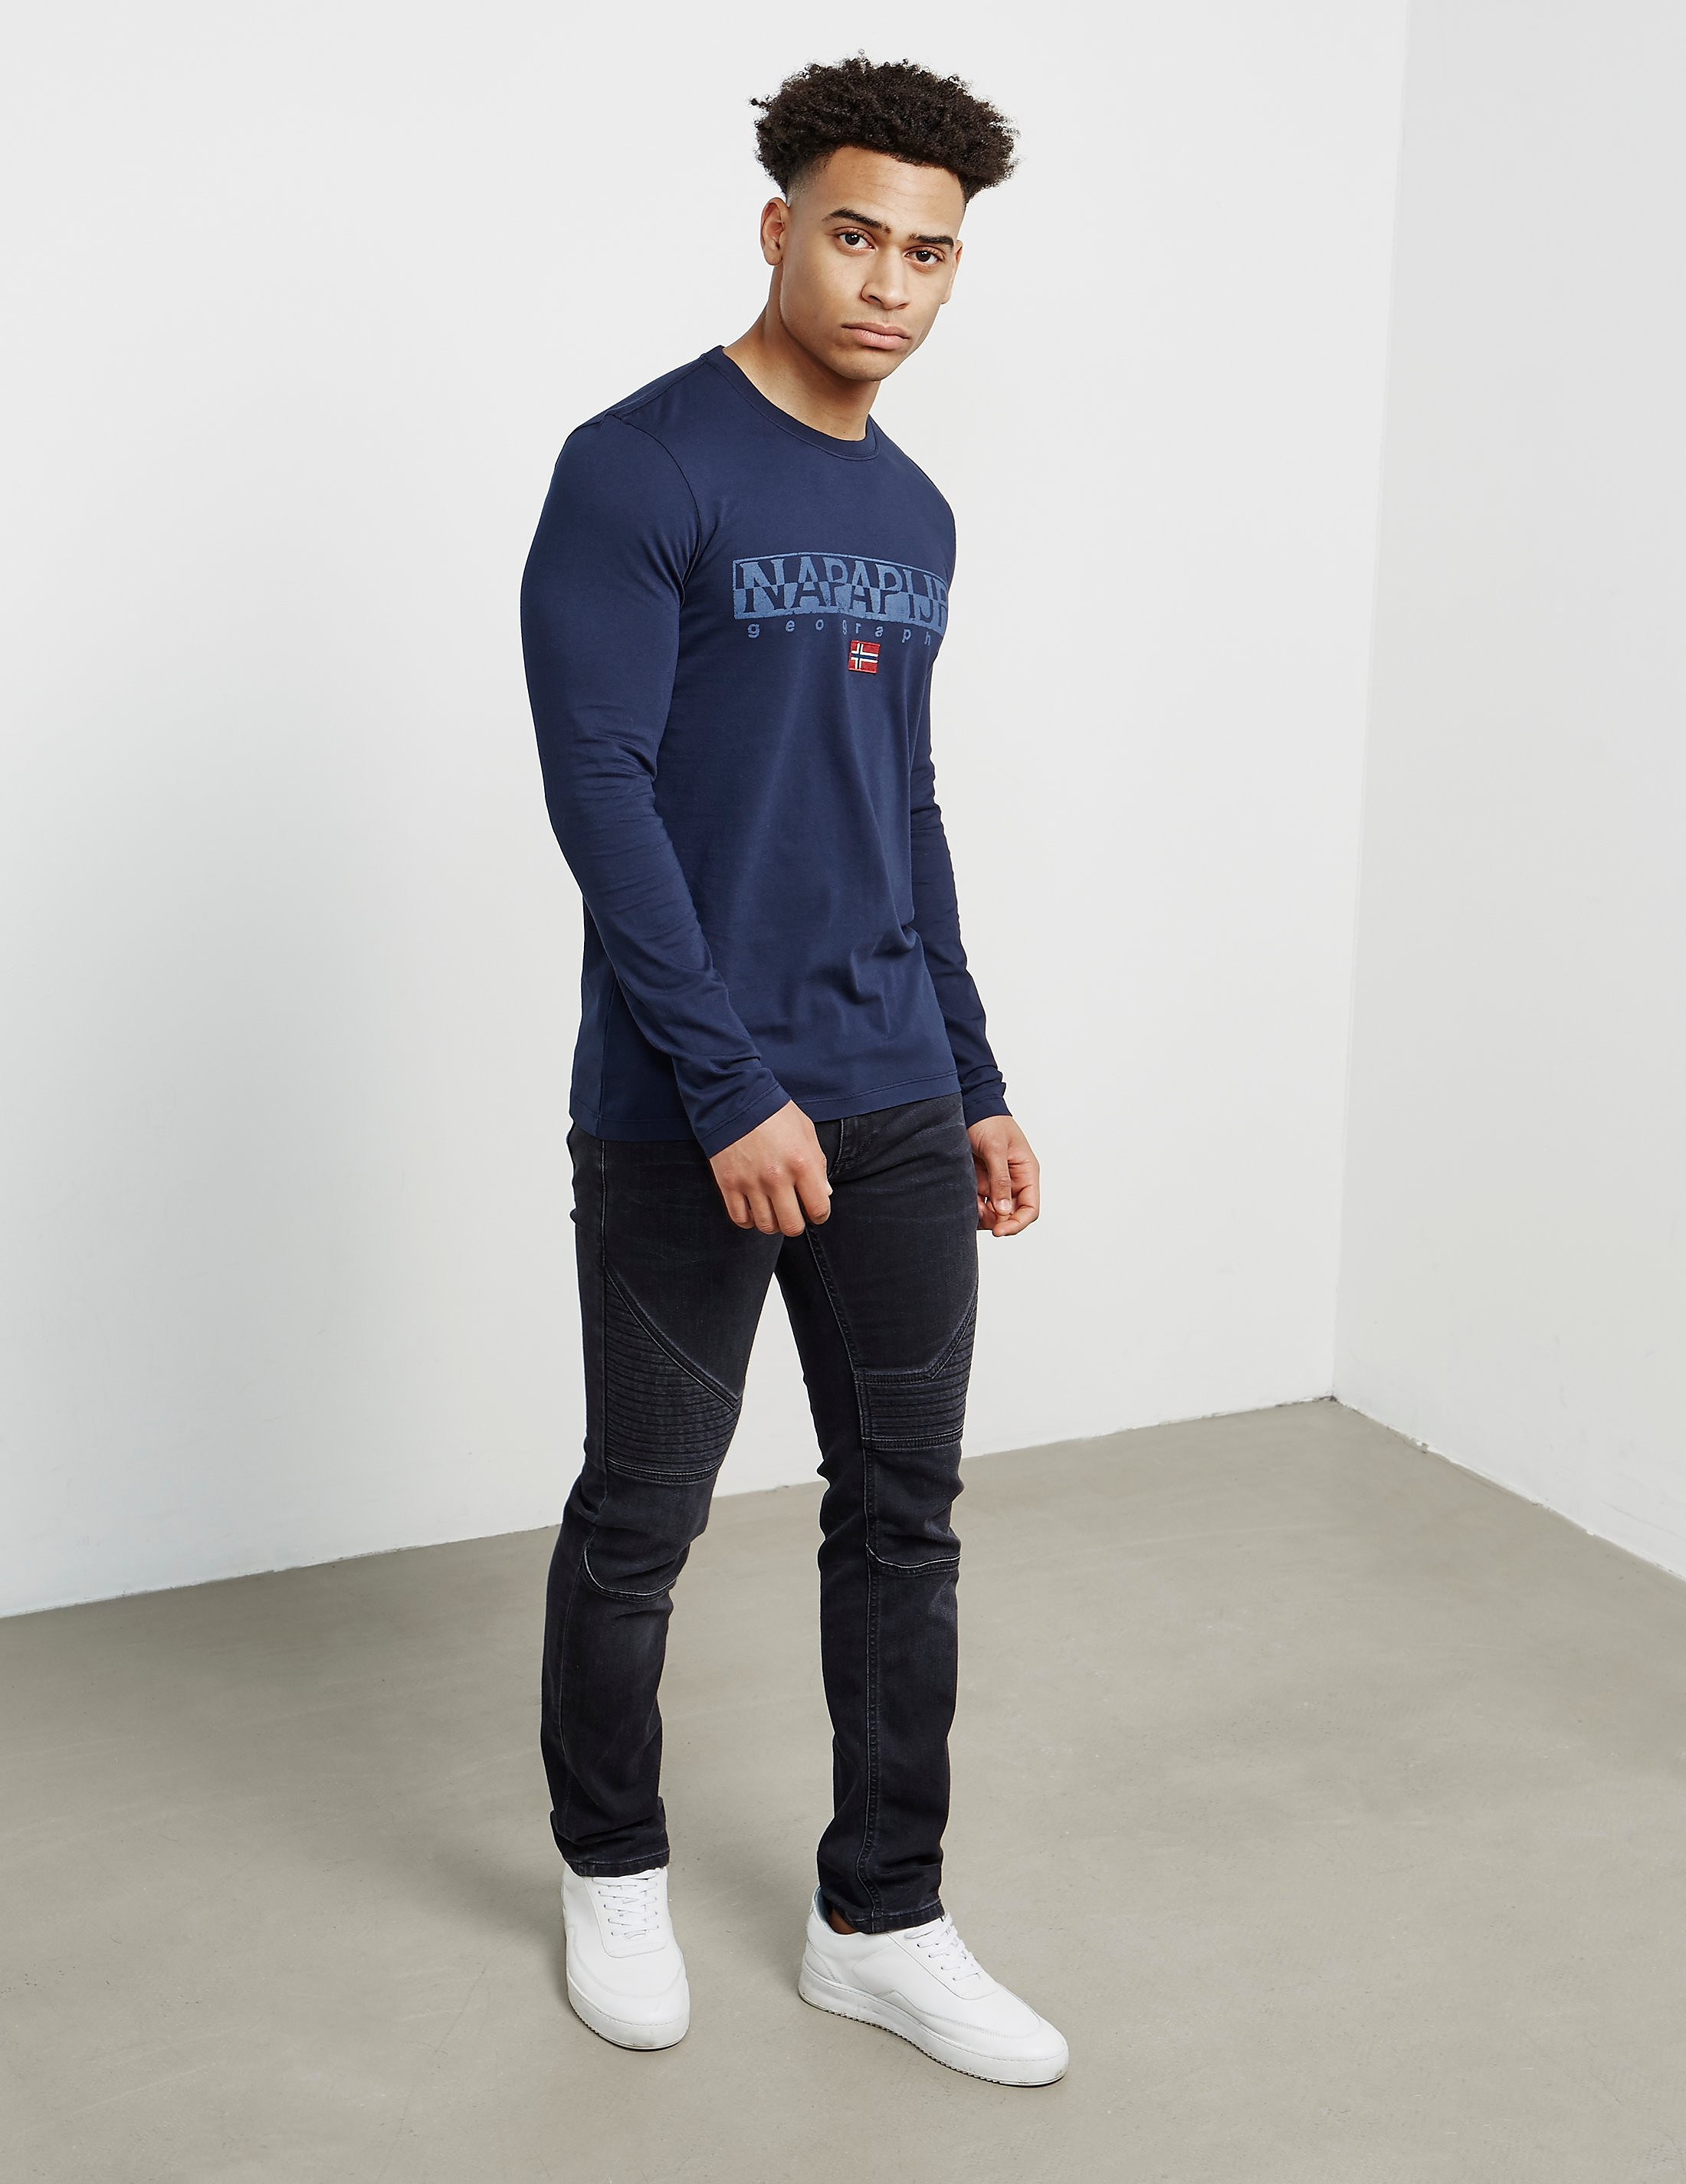 Napapijri Sapriol Long Sleeve T-Shirt - Exclusive